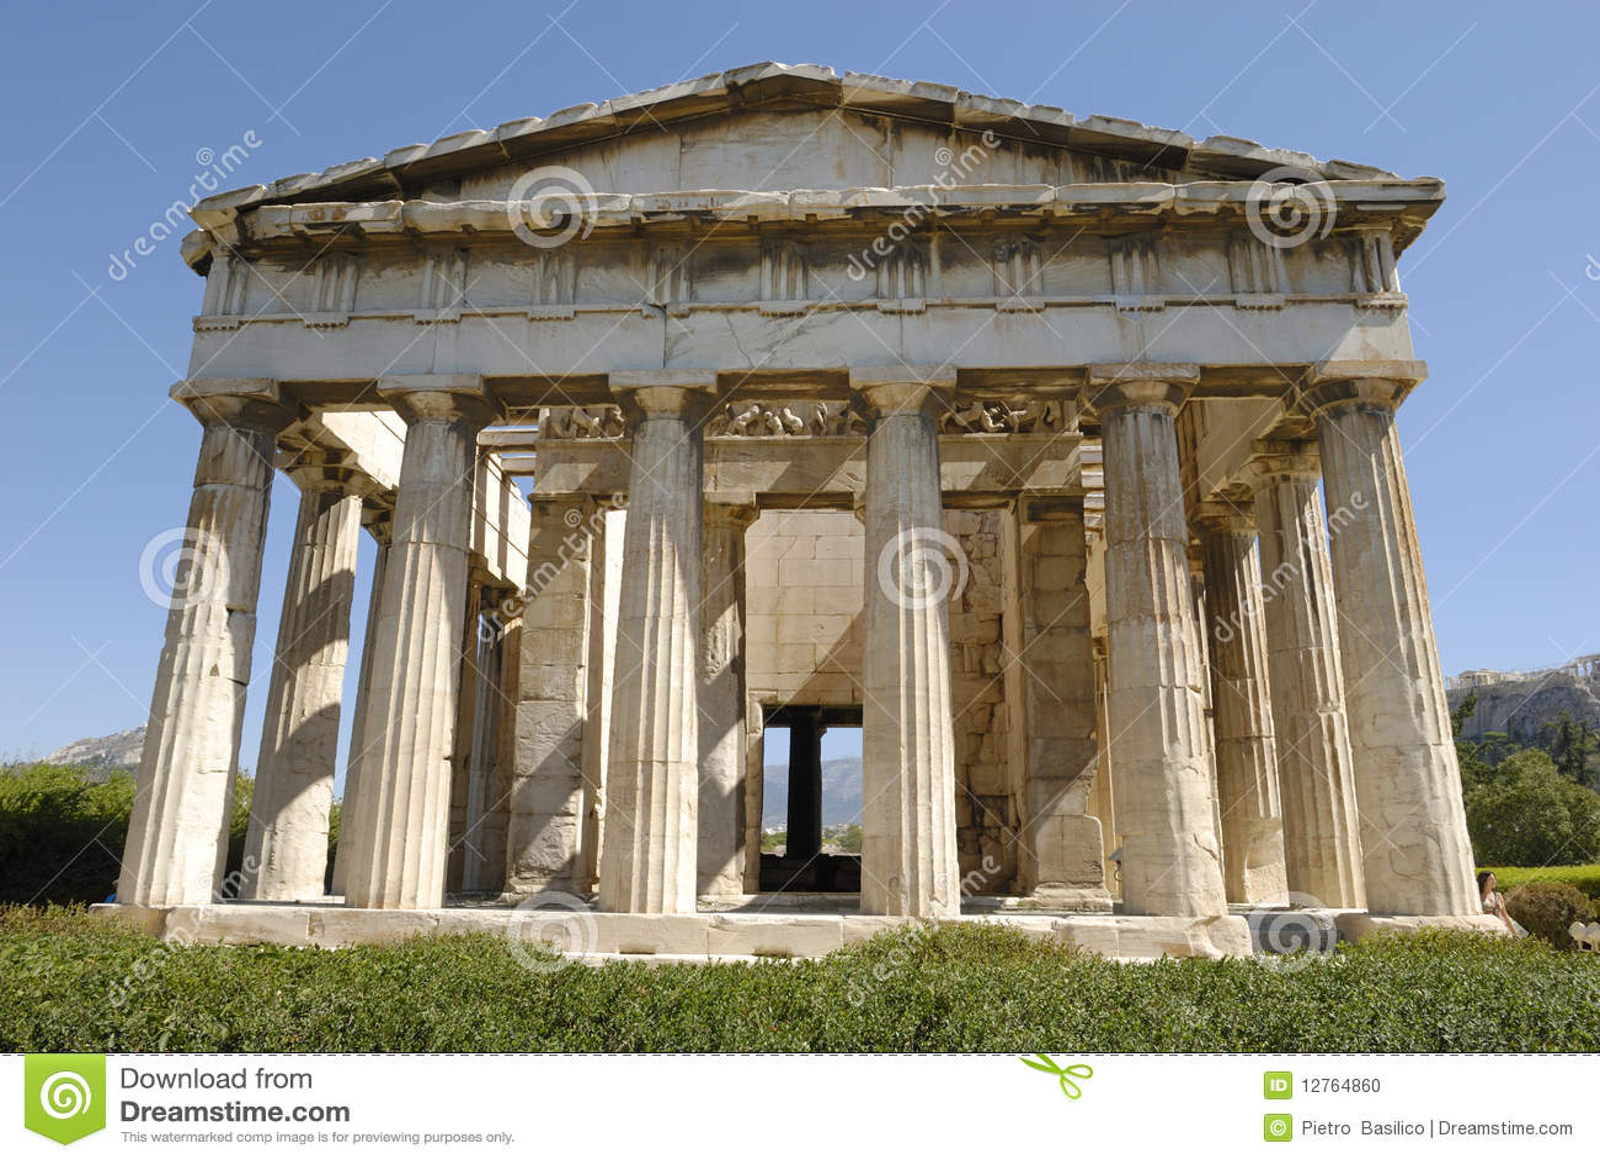 Athens Temple Of Hephaestus Stock Photo - Image: 12764860